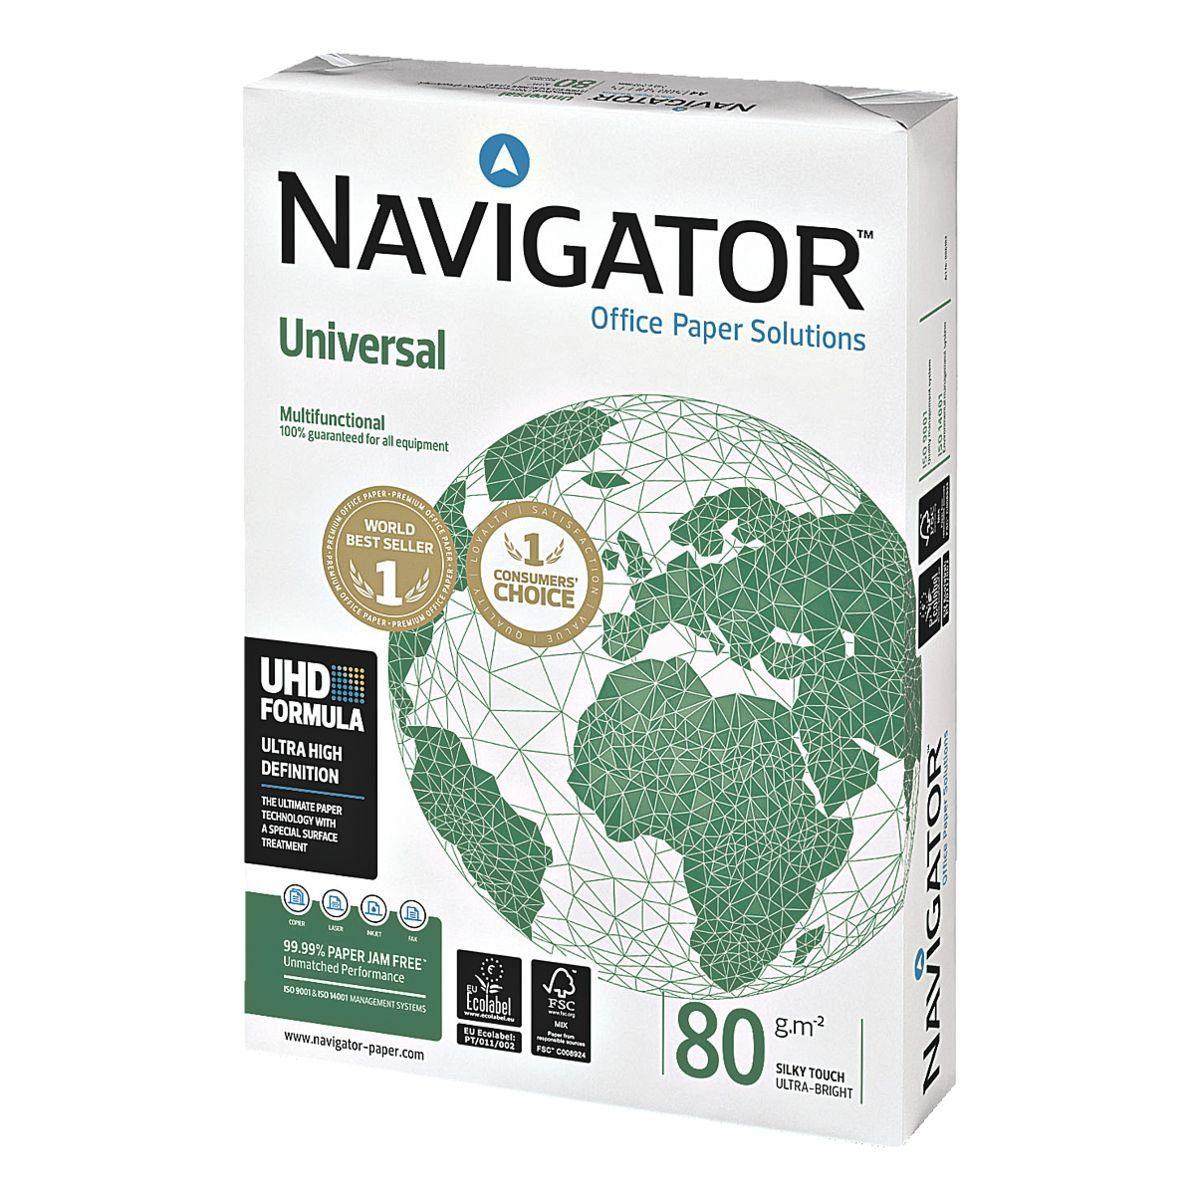 Navigator Multifunktionales Druckerpapier »Universal«